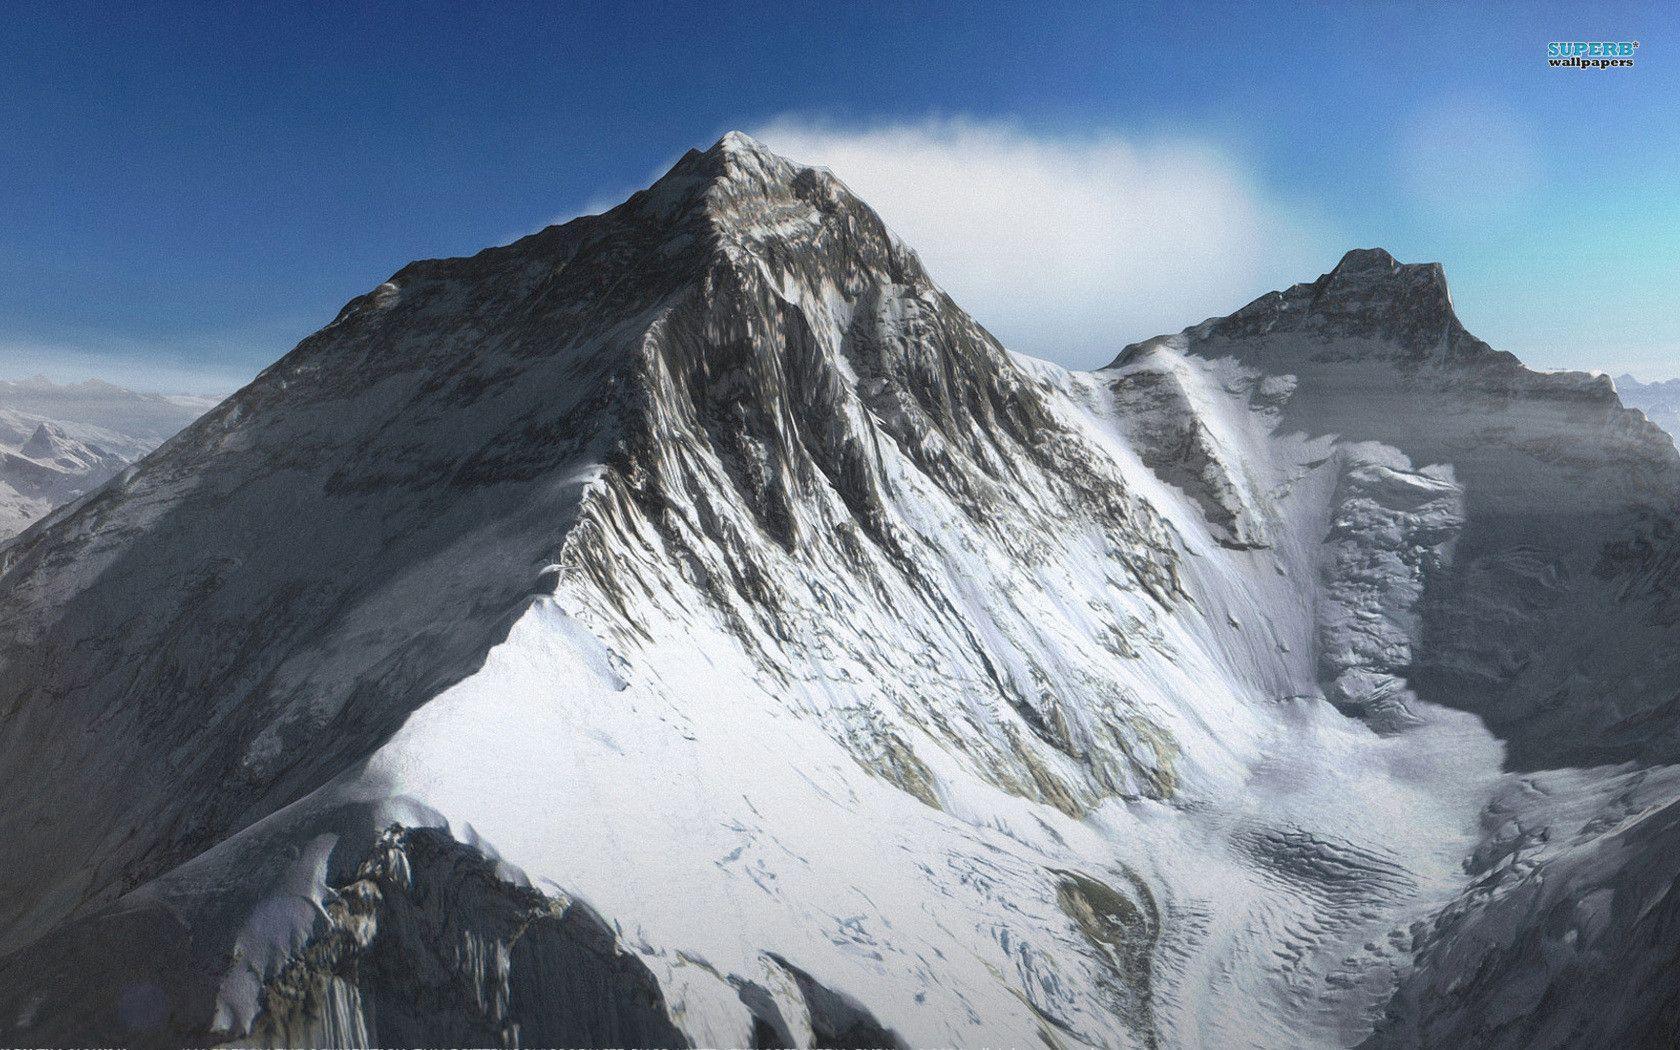 Mount Everest wallpaper - Nature wallpapers - #